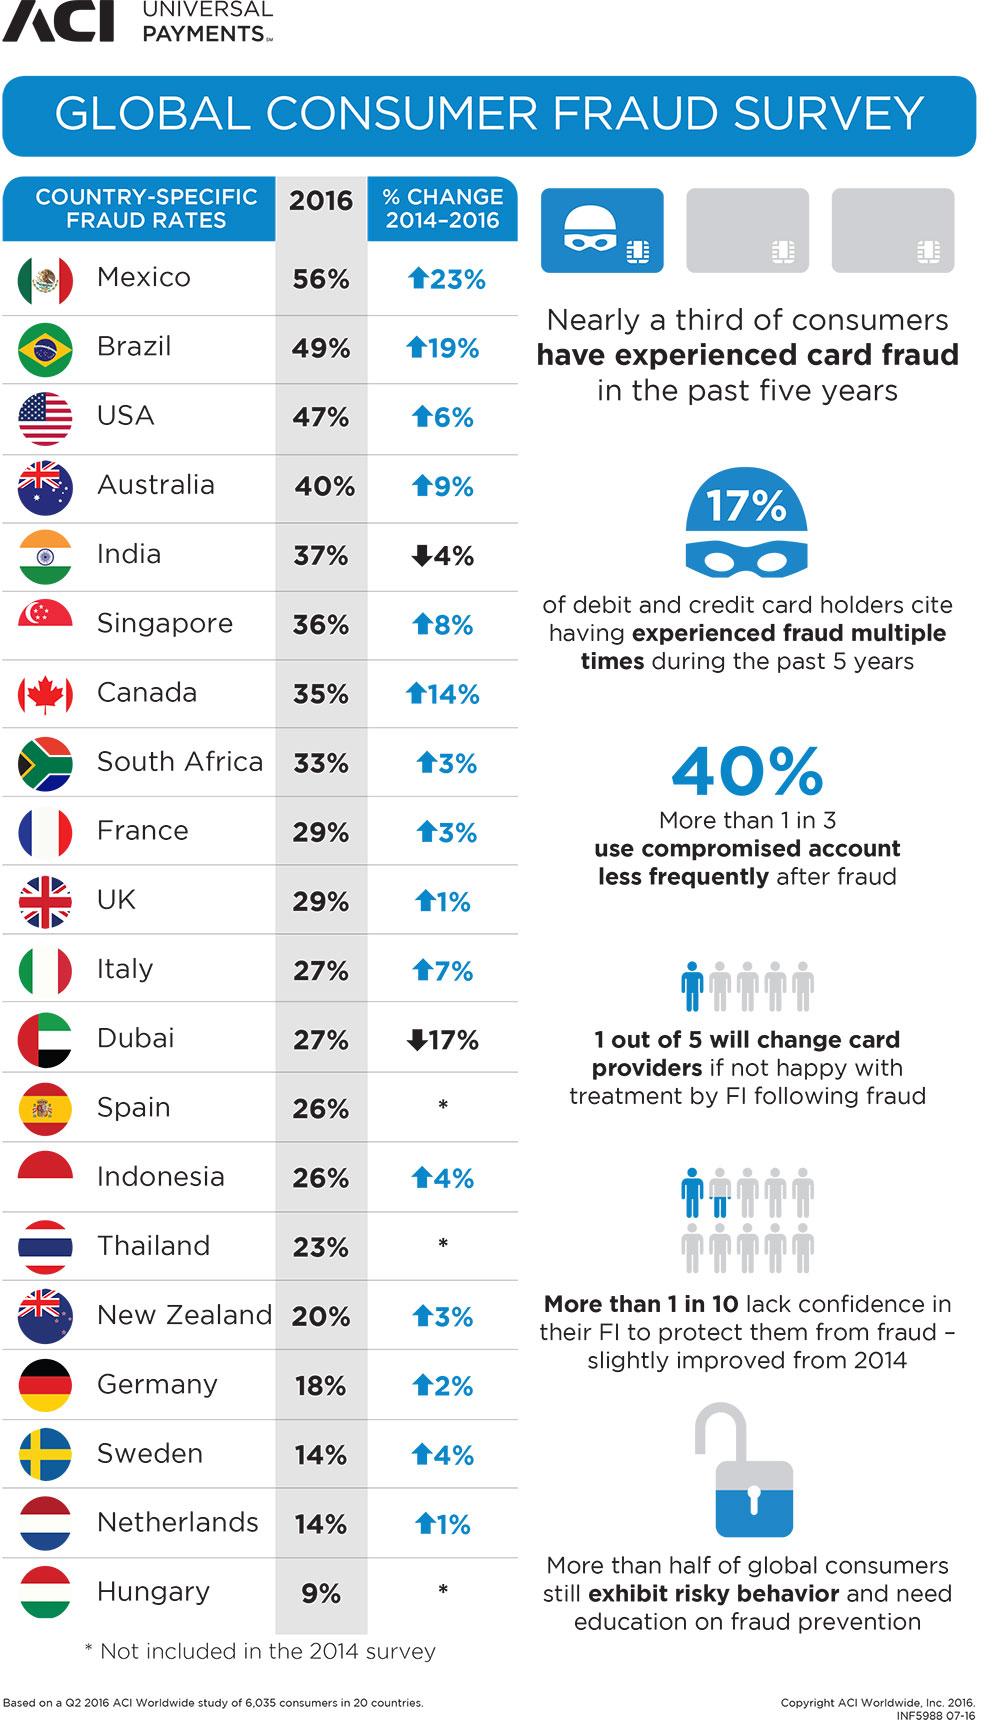 ACI-Global-Consumer-Fraud-Survey-2016-Infographic